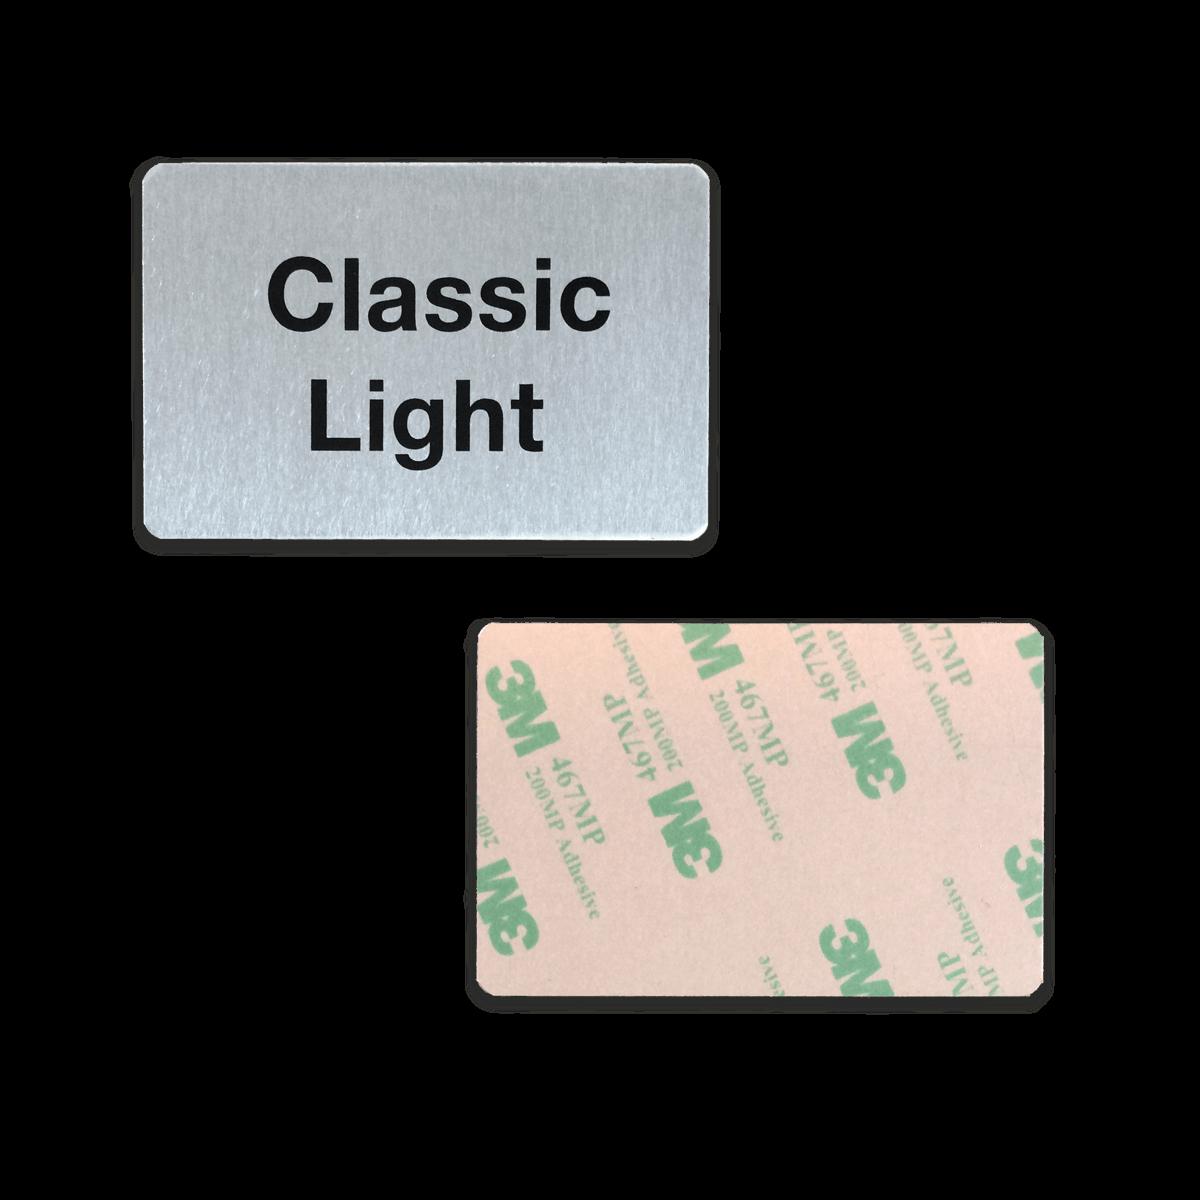 QNP makes custom 5S tags